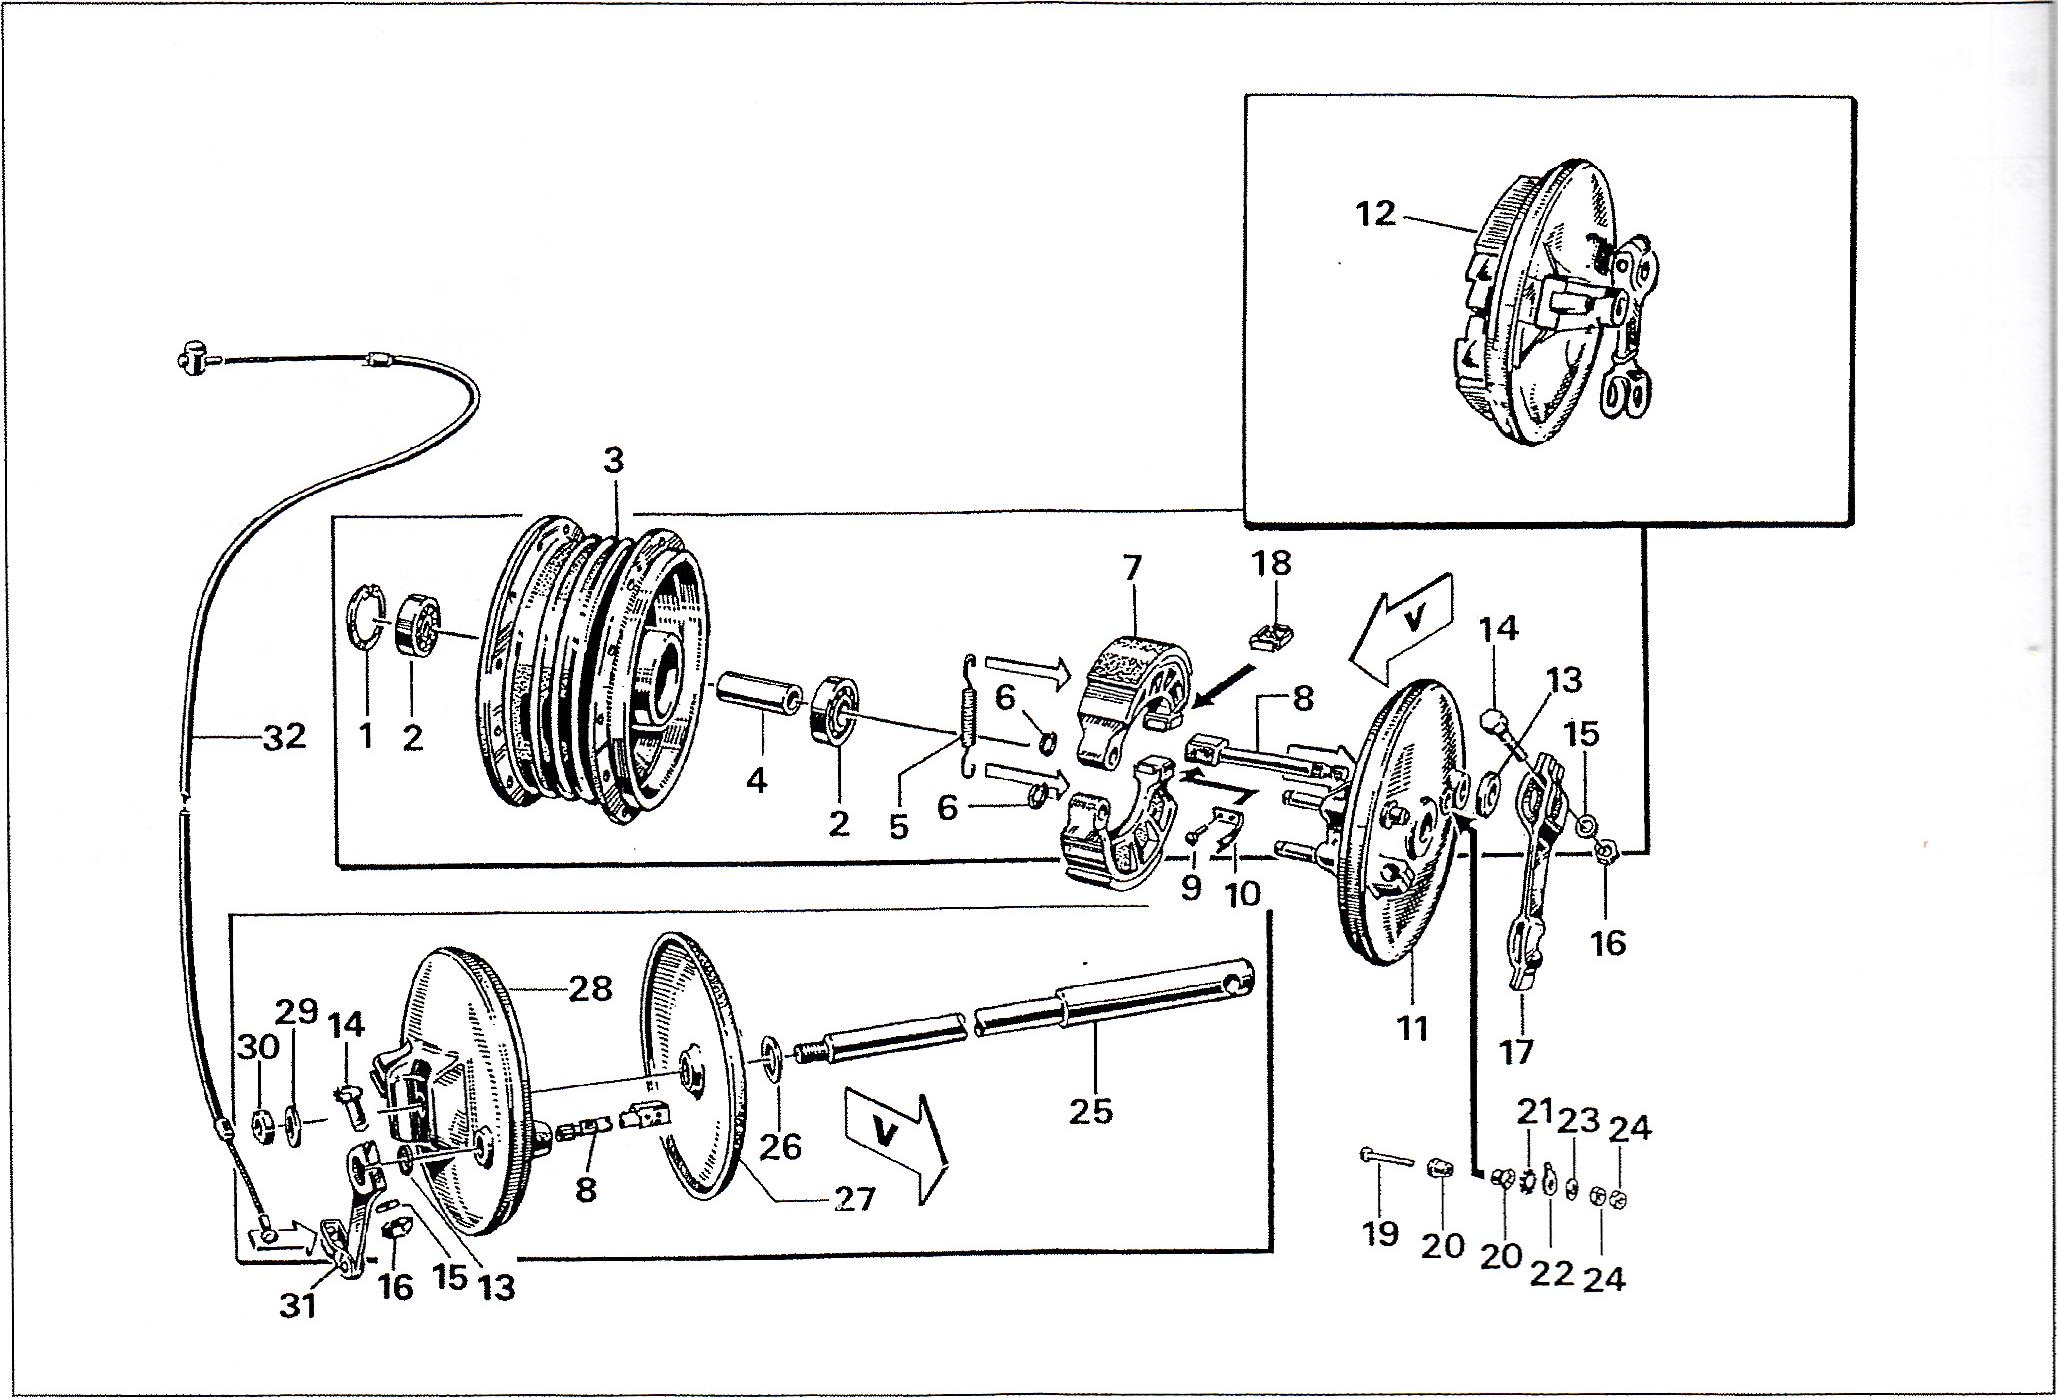 Simson S51 - Bubnová brzda, středy kol, náby